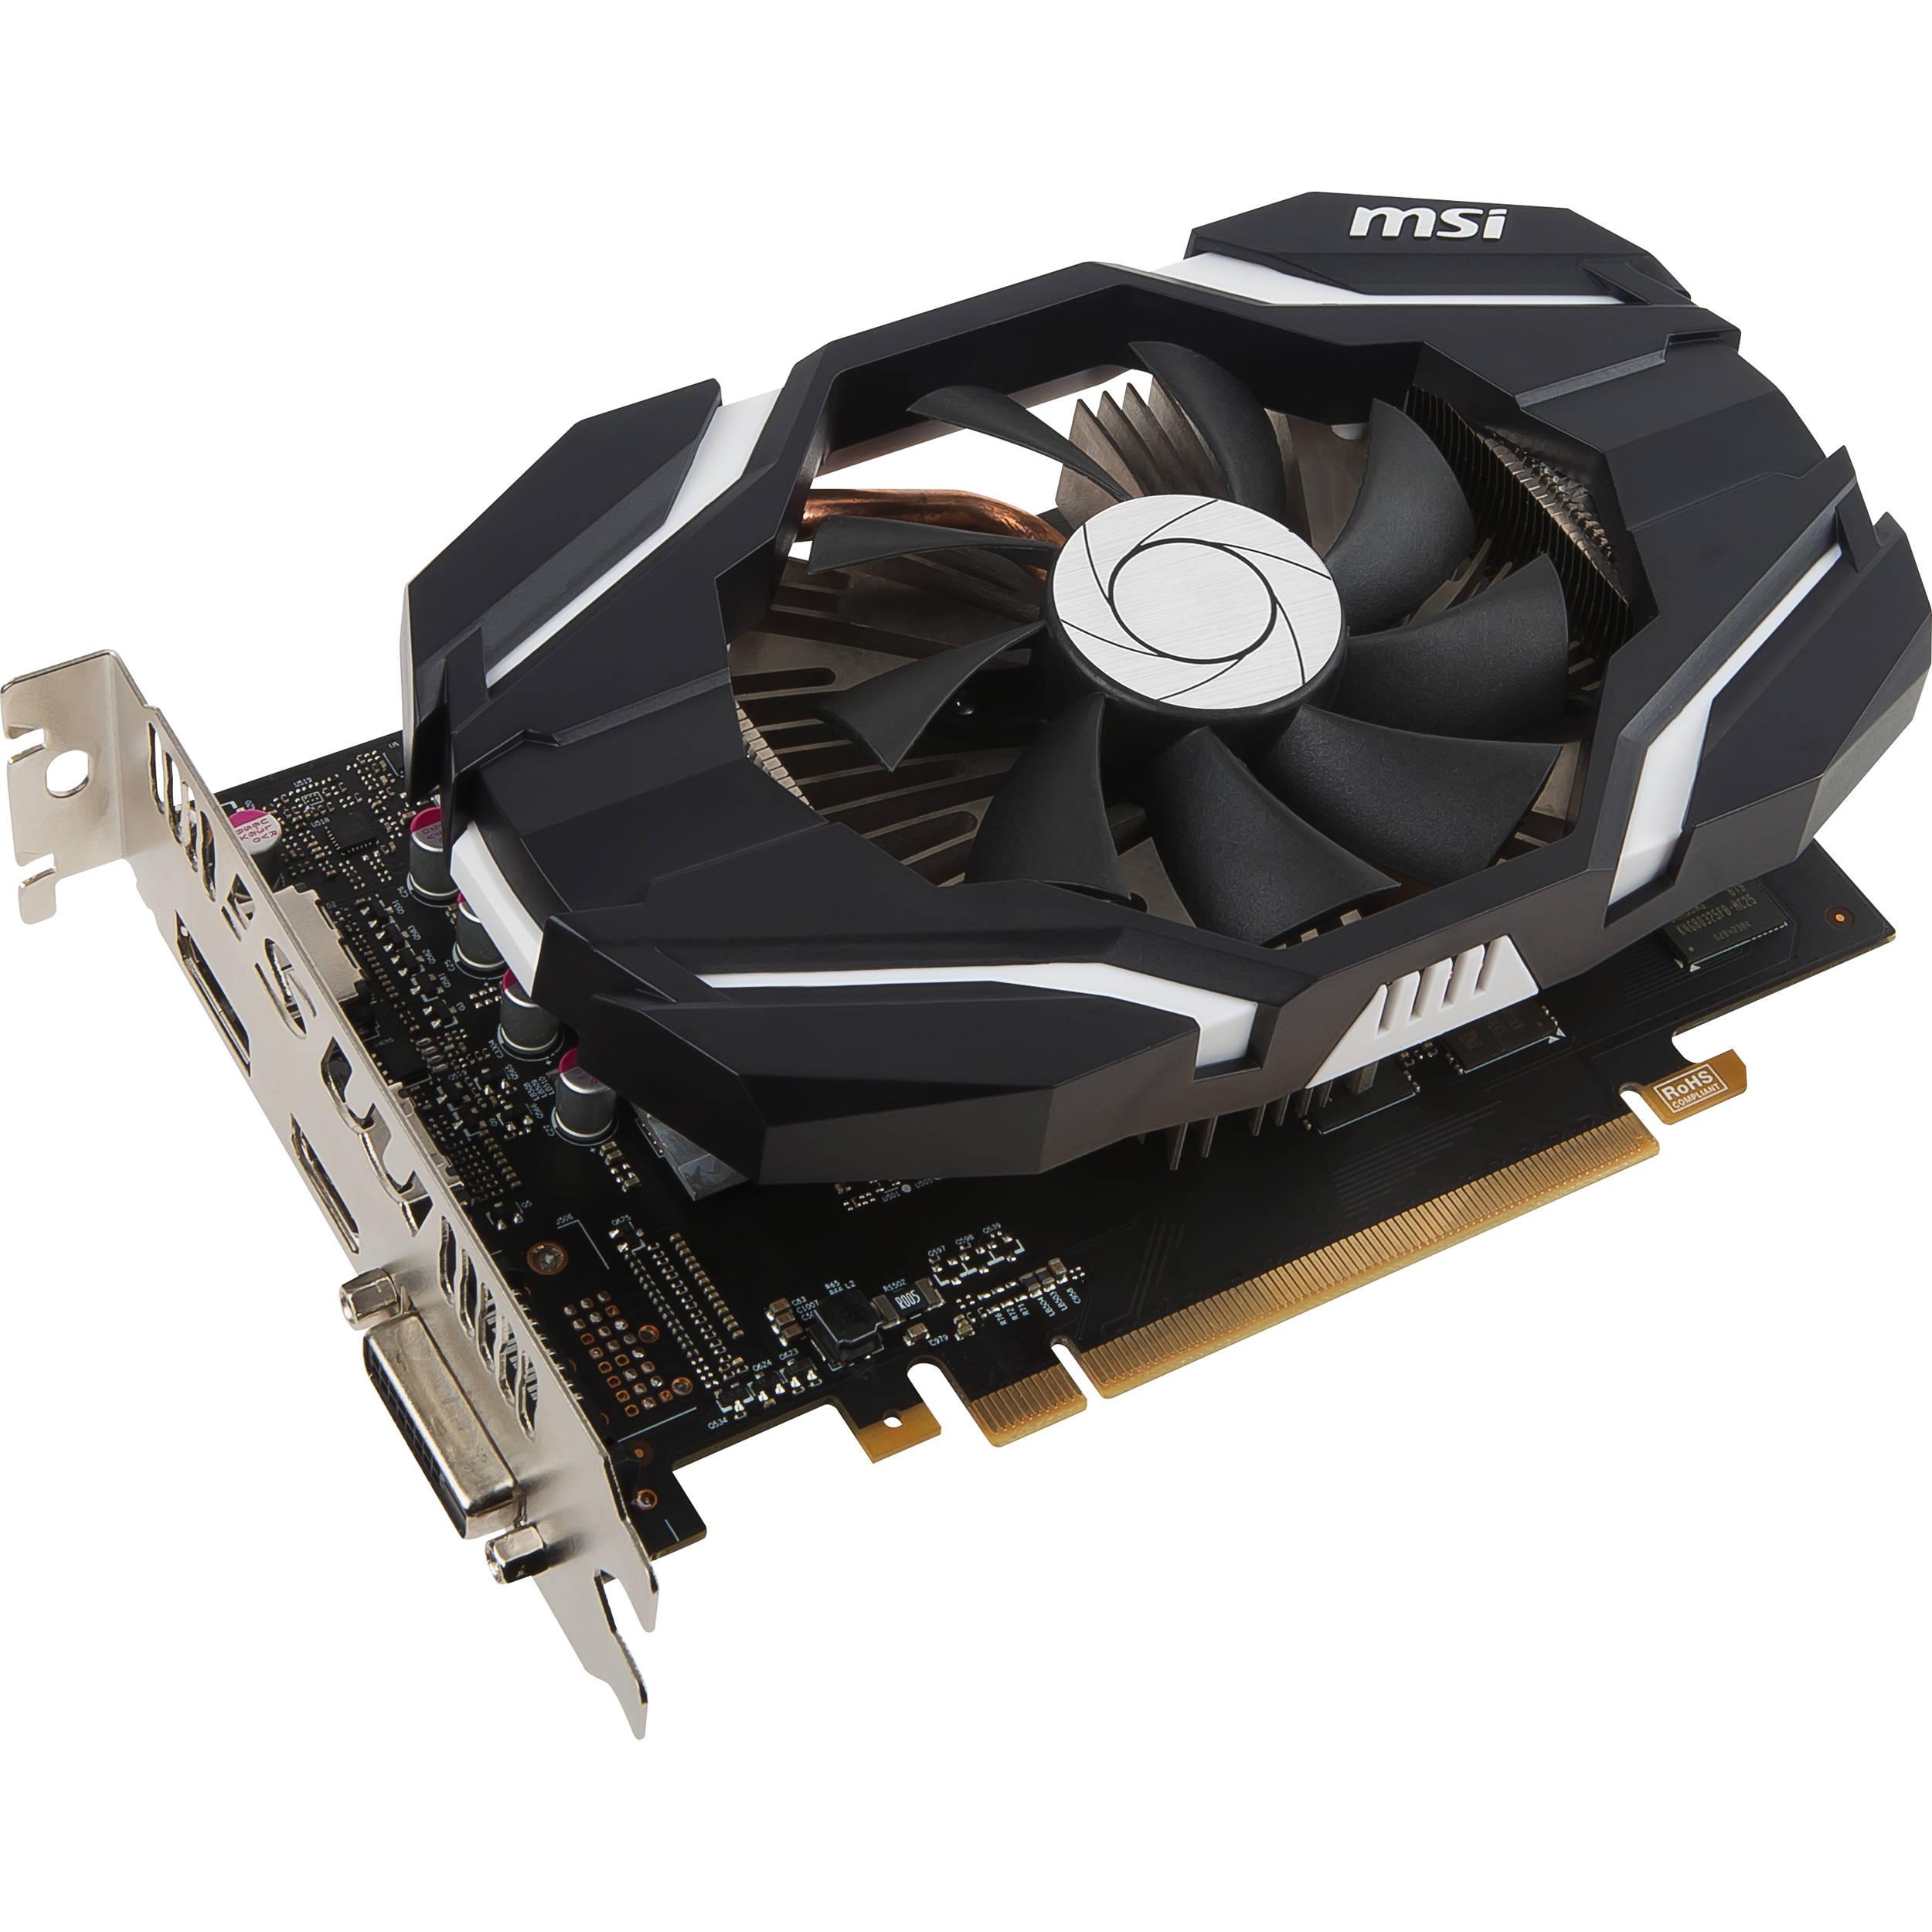 MSI GeForce GTX 1060 6G OCV1 Graphics Card